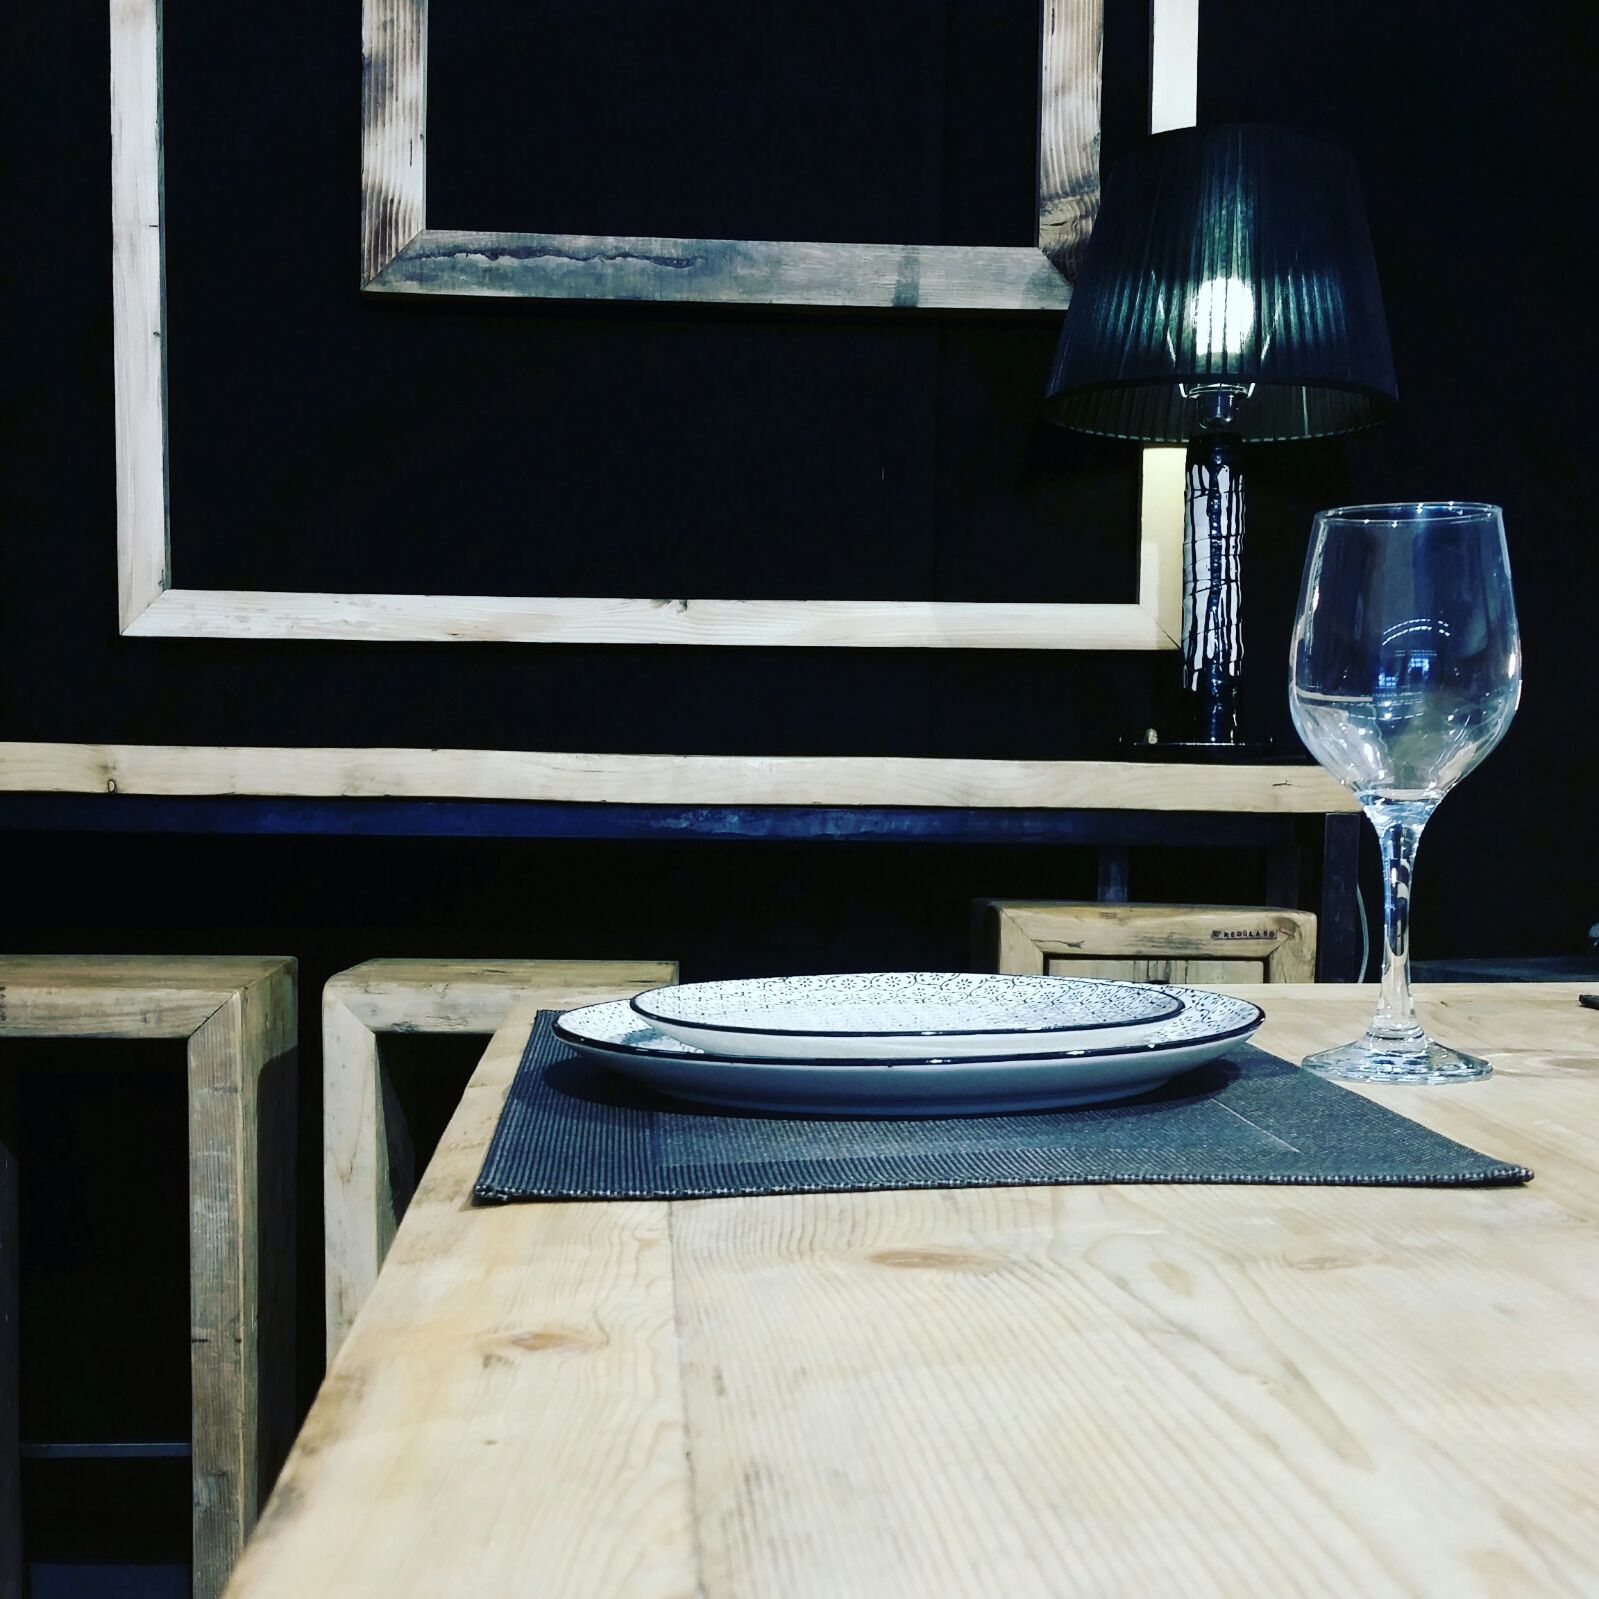 Casa su misura 2016 a padova fiere fb light works for Fiere casa 2017